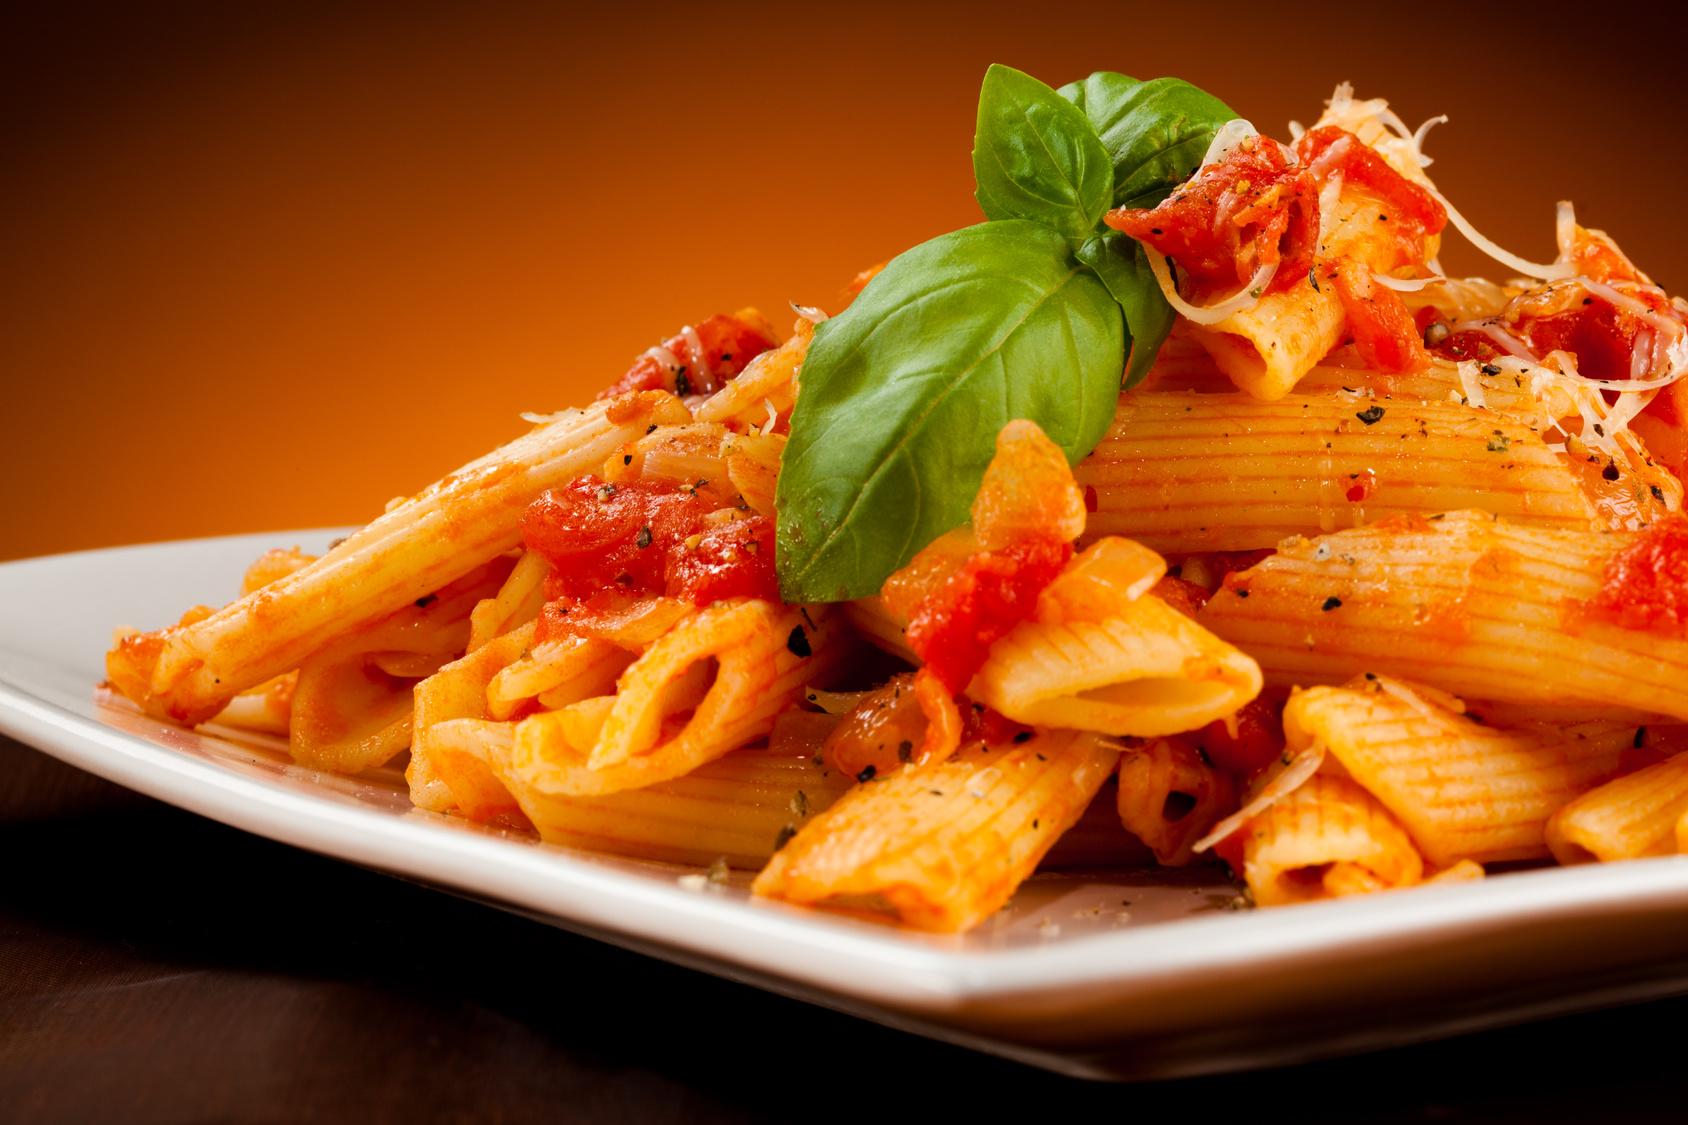 Nudelgerichte, Penne, Rigatoni, Lasagne